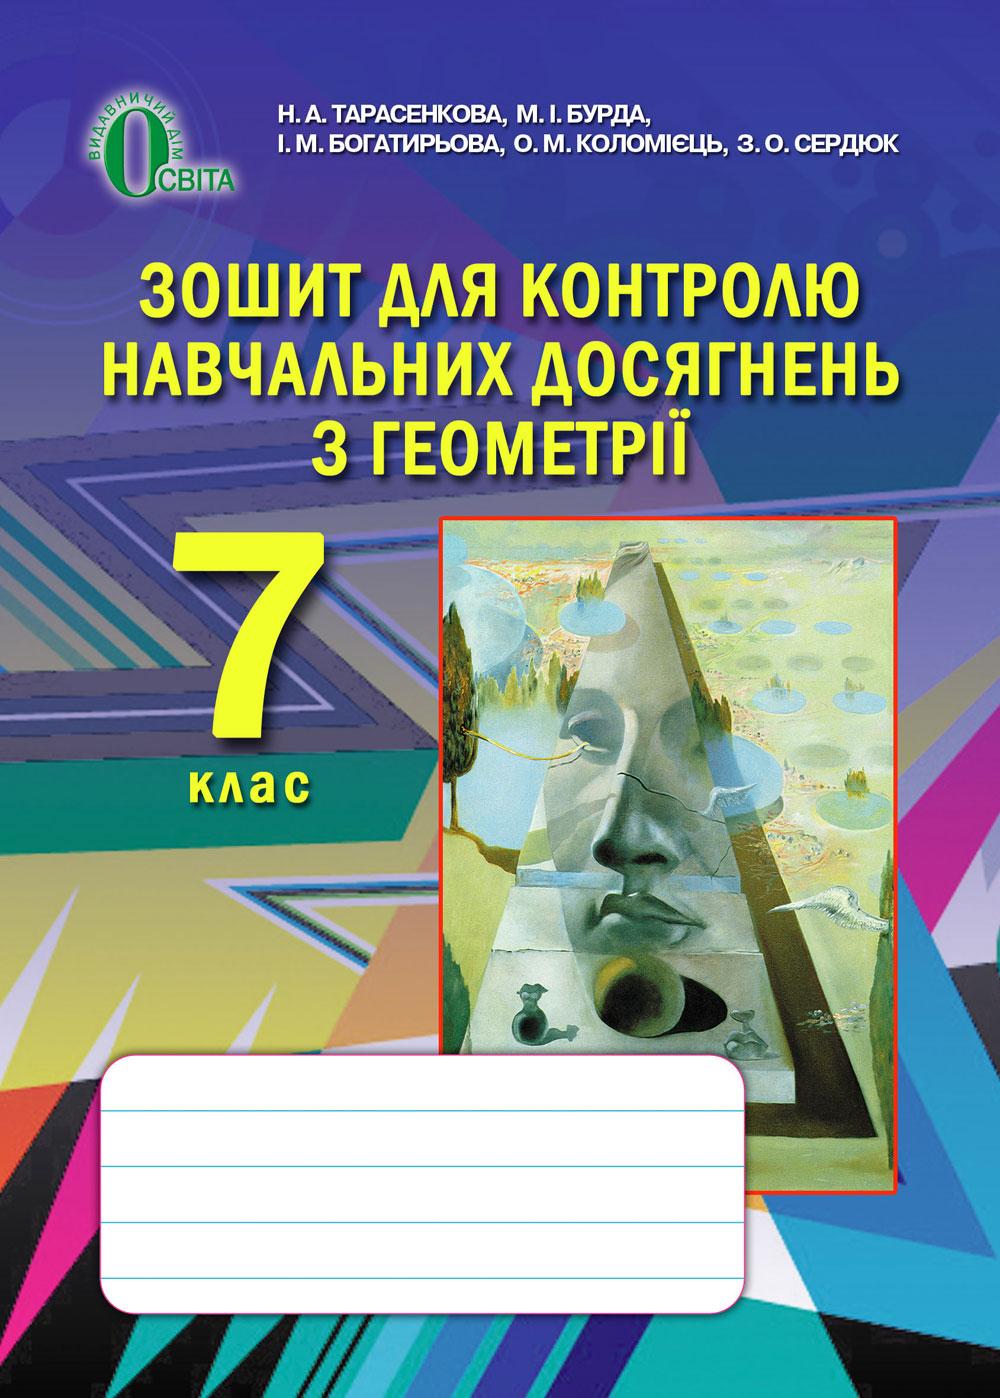 програма геометрия нова класс 7 гдз 2018